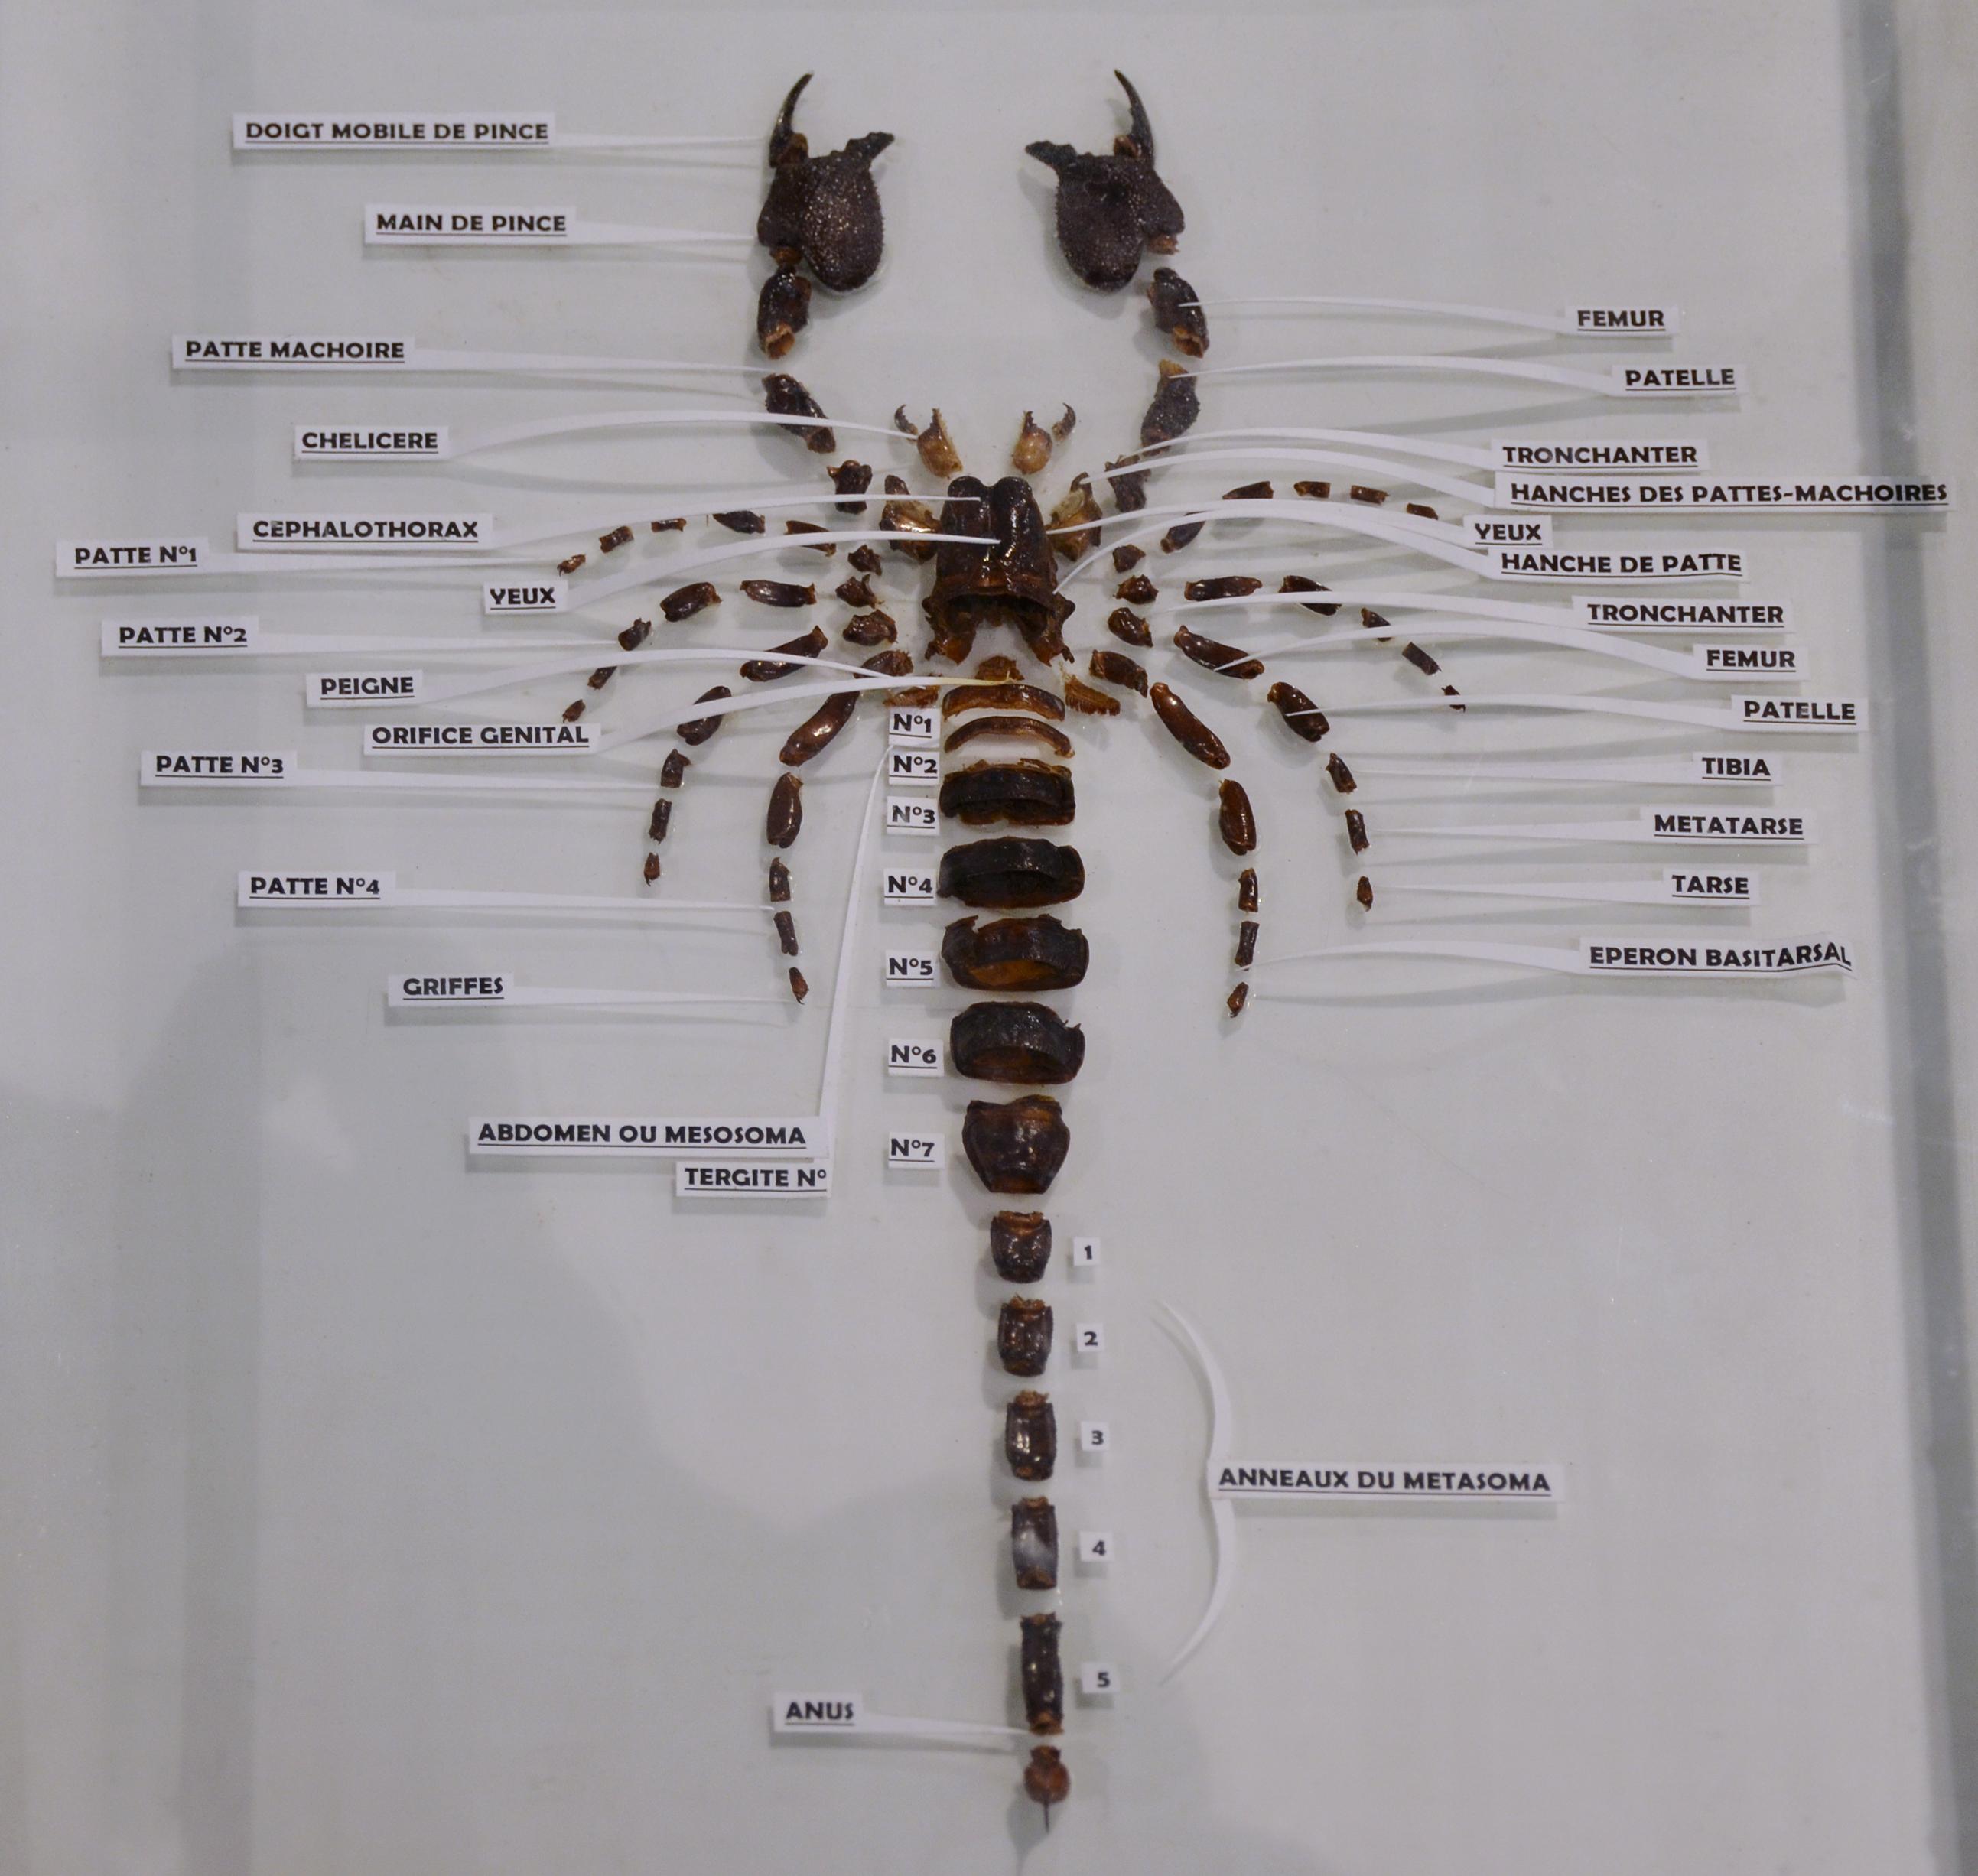 File:Anatomie du scorpion Pandinus imperator 07042016.jpg ...